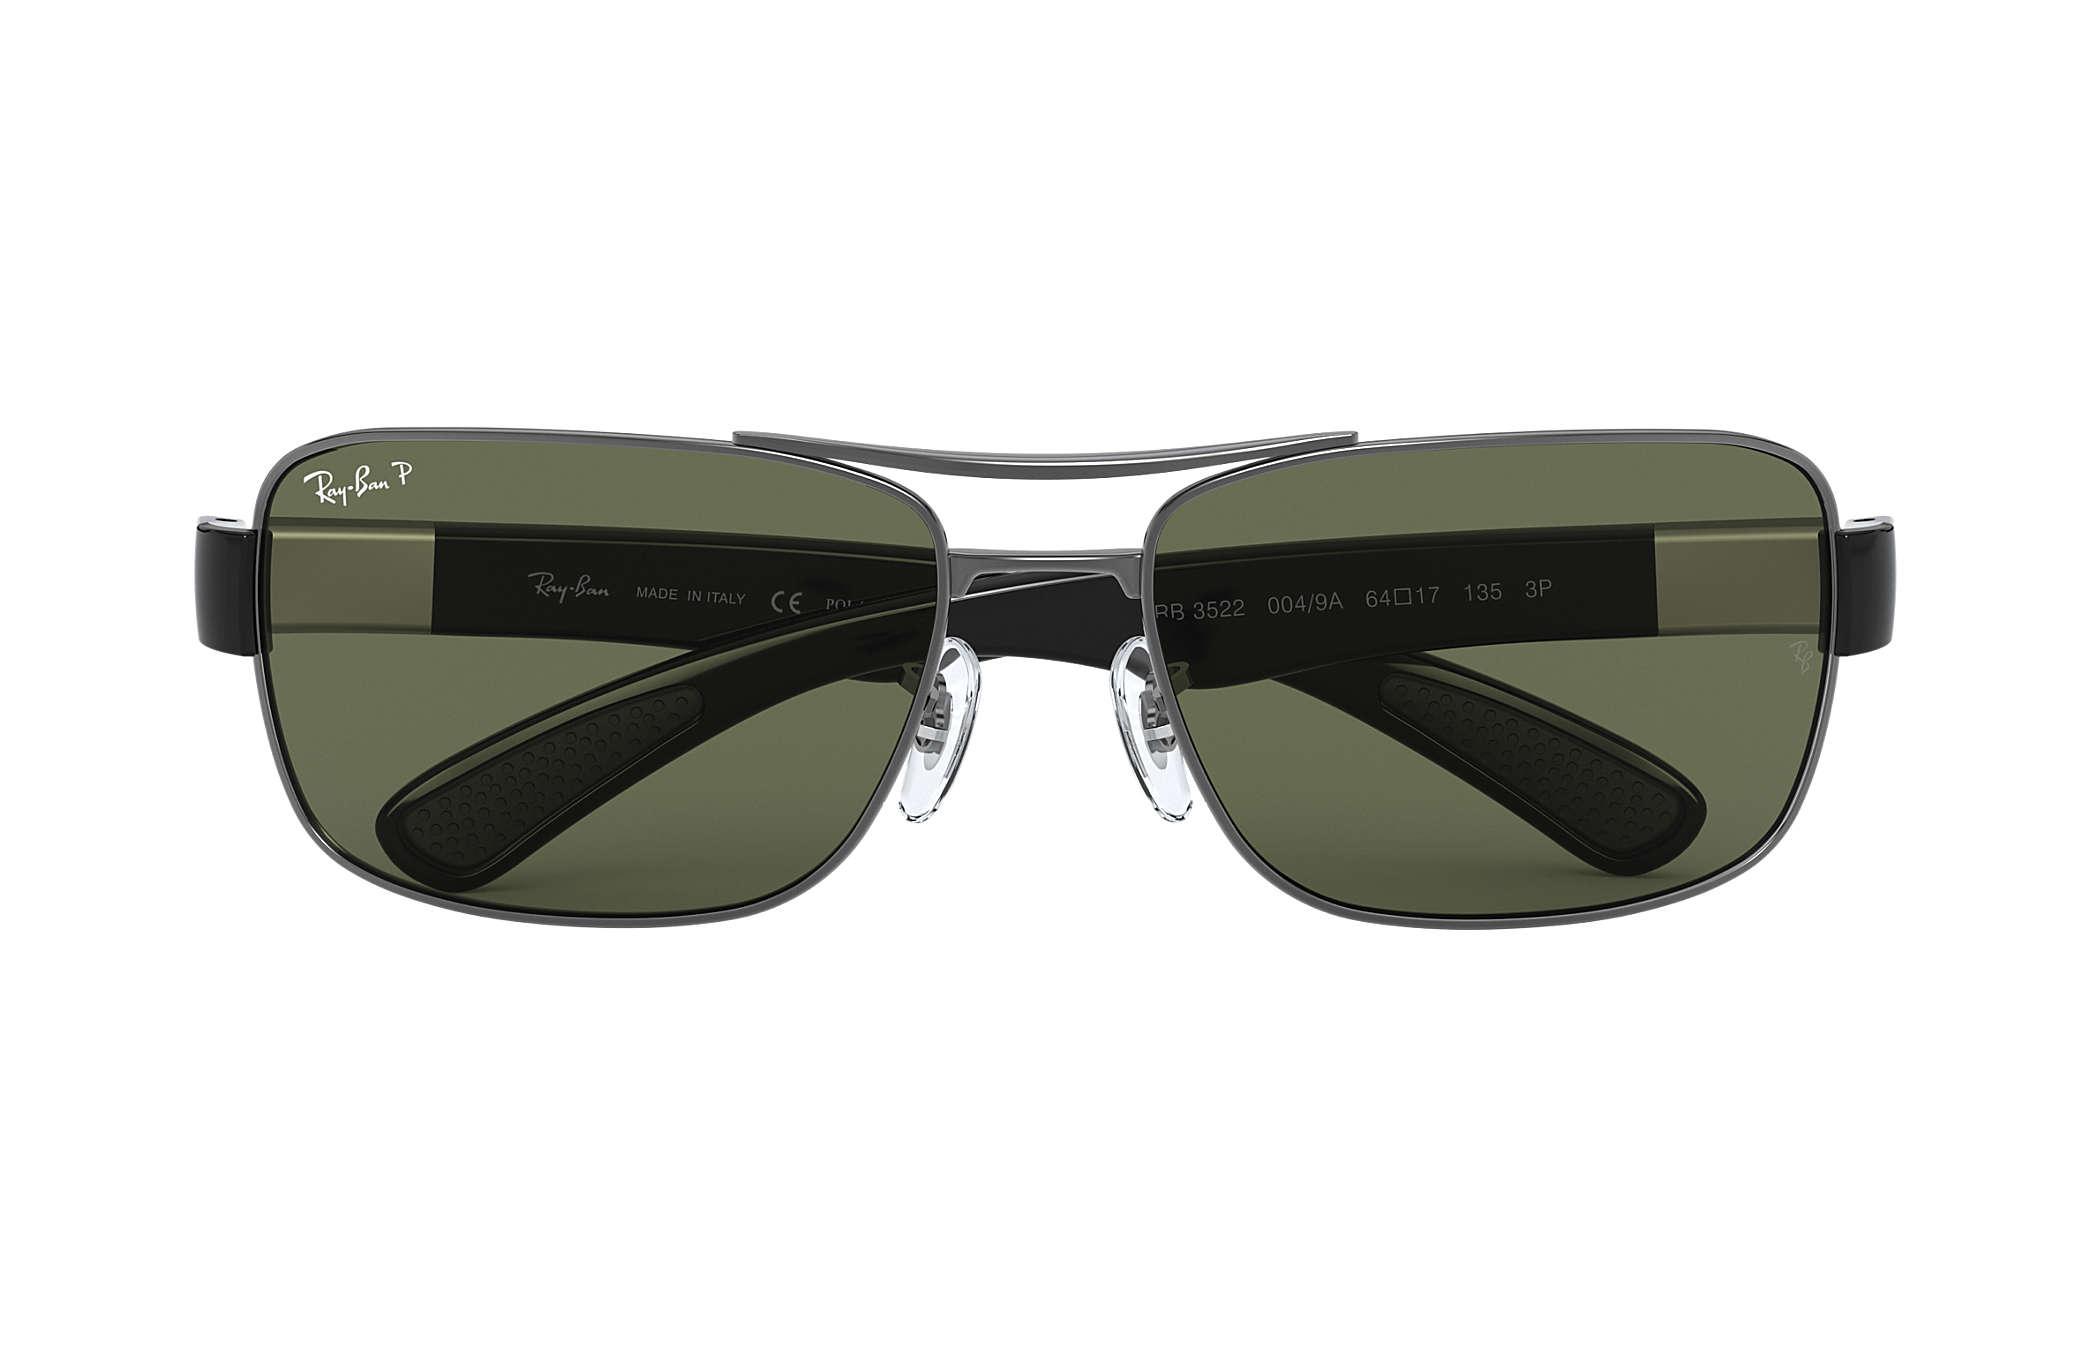 Verde Gunmetal Polarizadas Rb3522 Ban Ray Metal Lentes qSUzjGLMVp